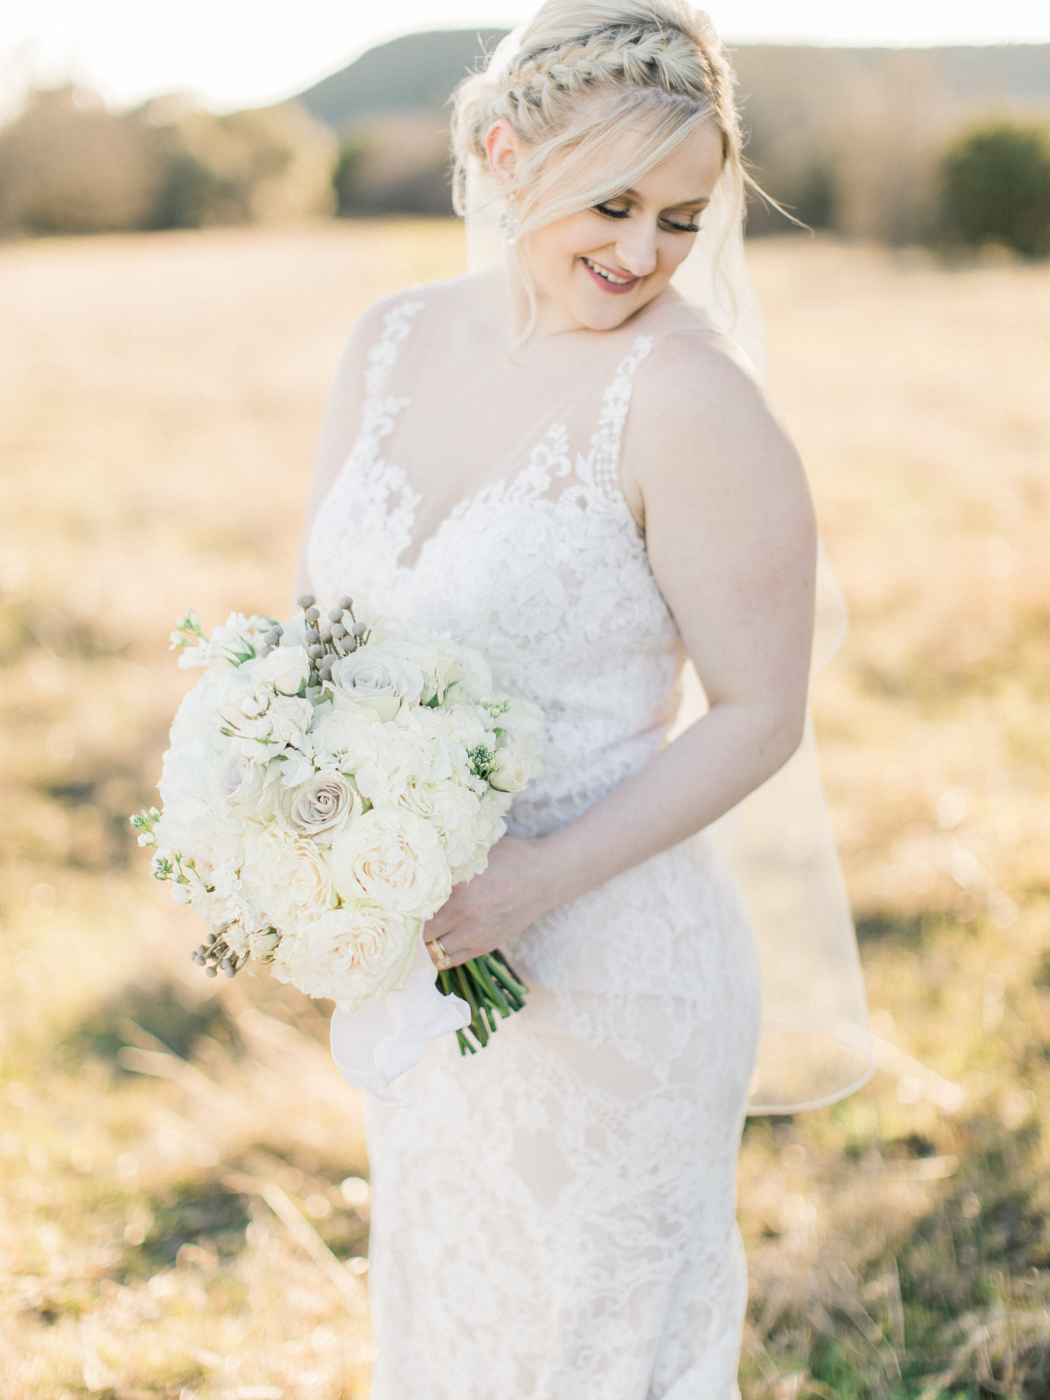 Wichita Falls, TX - Romantic Wedding Photos